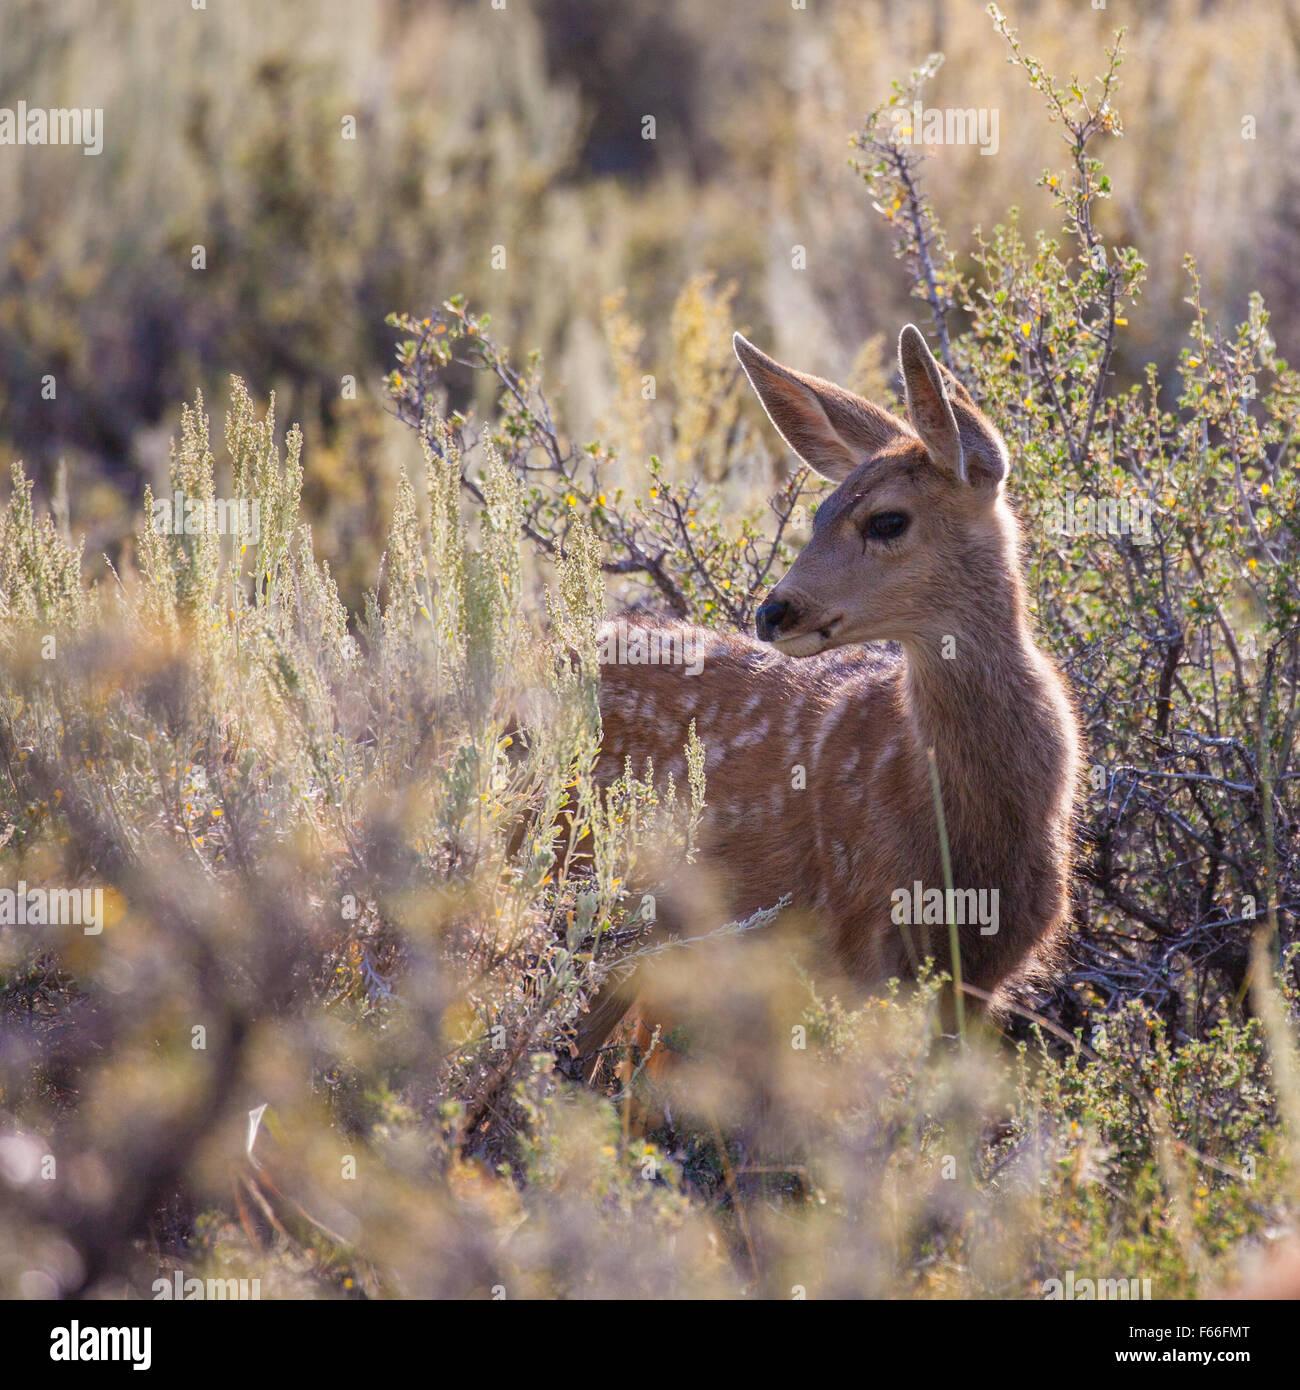 Mule Deer Fawn (Odocoileus hemionus) in the high desert of Bridgeport, California - Stock Image